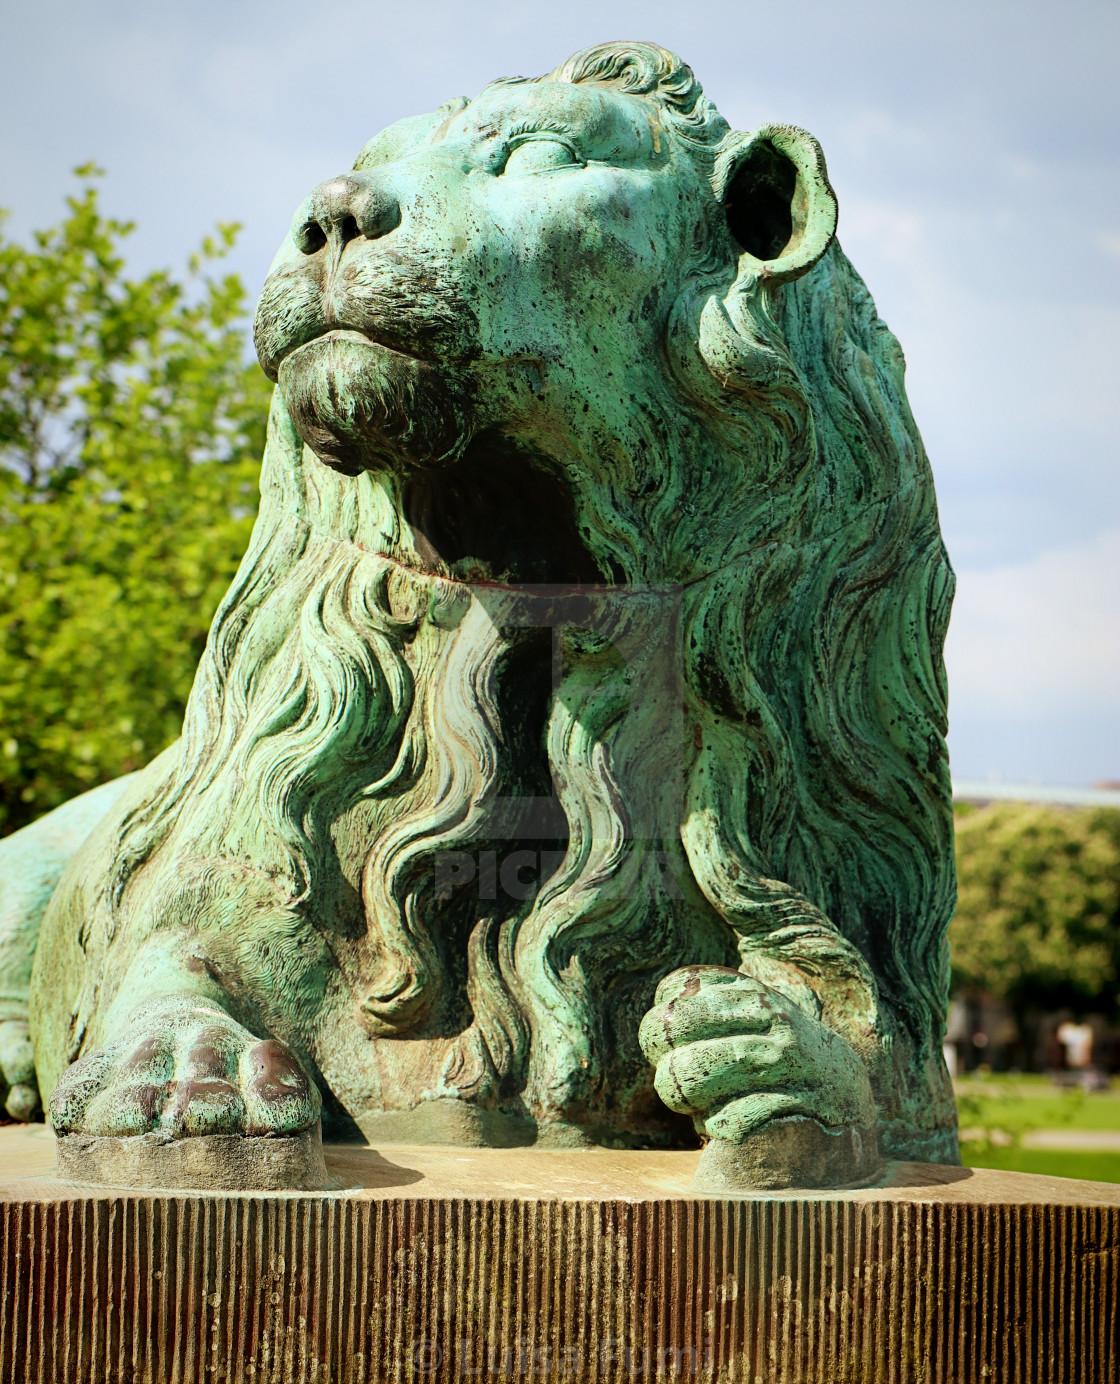 """COPENHAGEN, DENMARK - bronze green lion statue"" stock image"